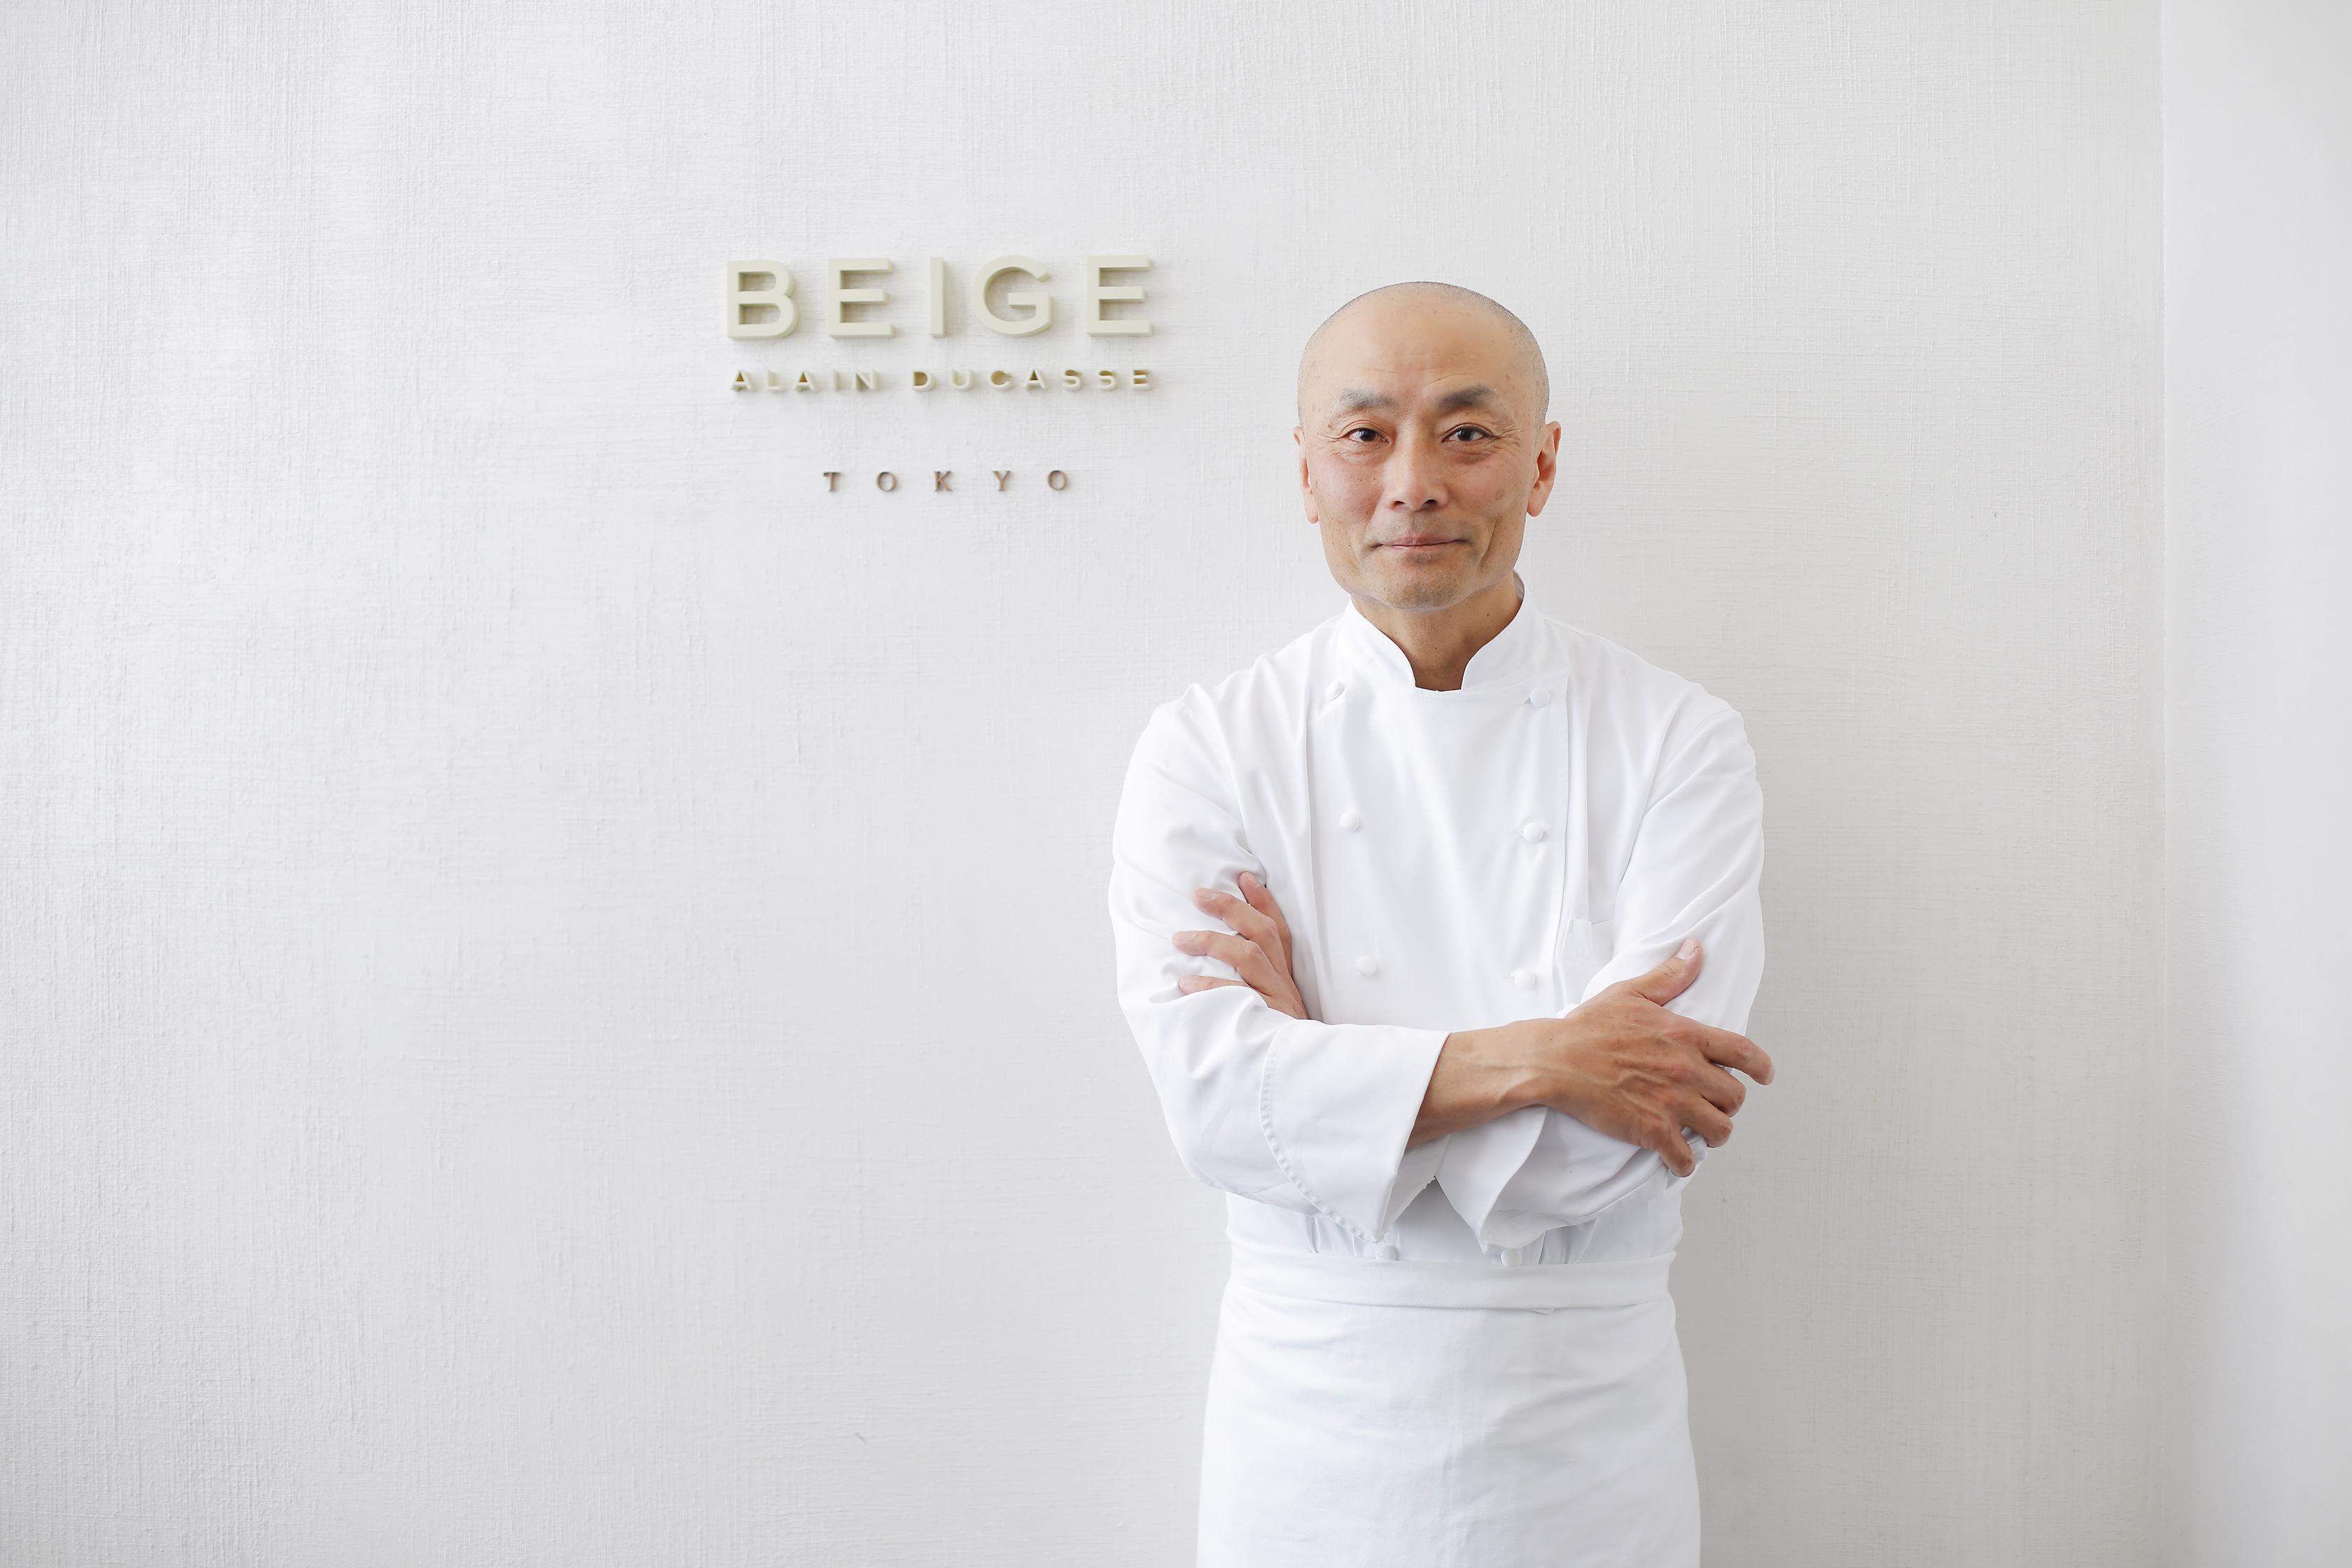 BEIGE ALAIN DUCASSE TOKYO Kei Kojima